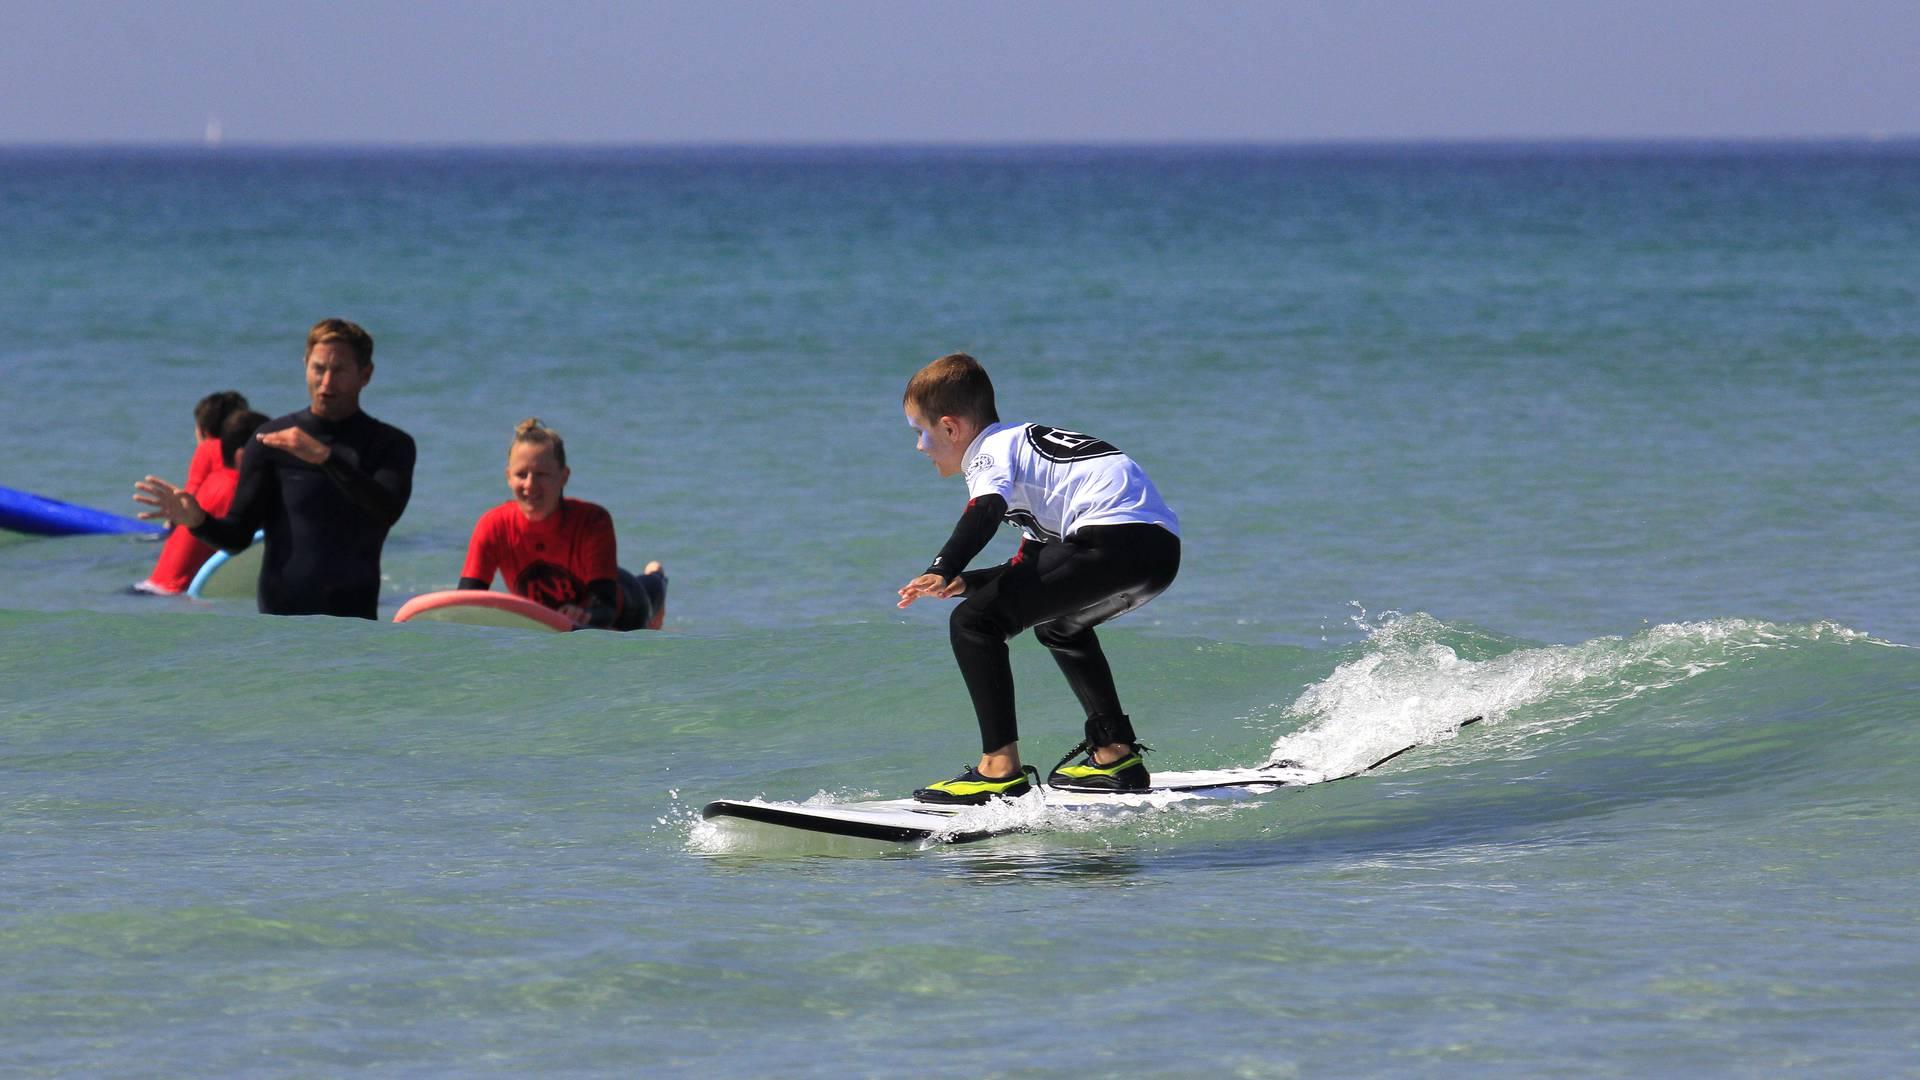 Ecole de surf de Penhors en Pays Bigouden © ESB Penhors